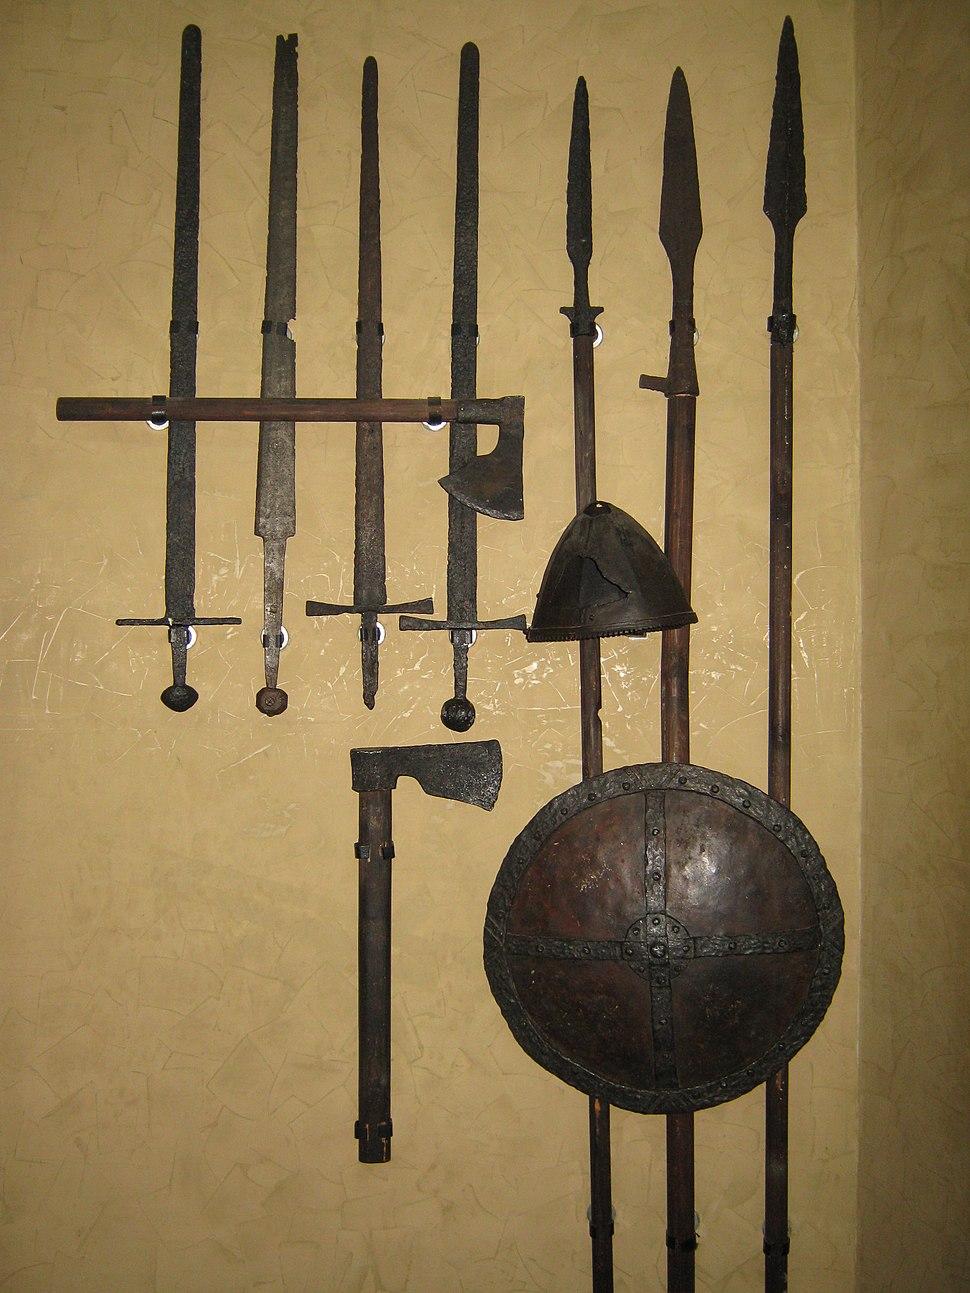 Serbian medieval army equipment